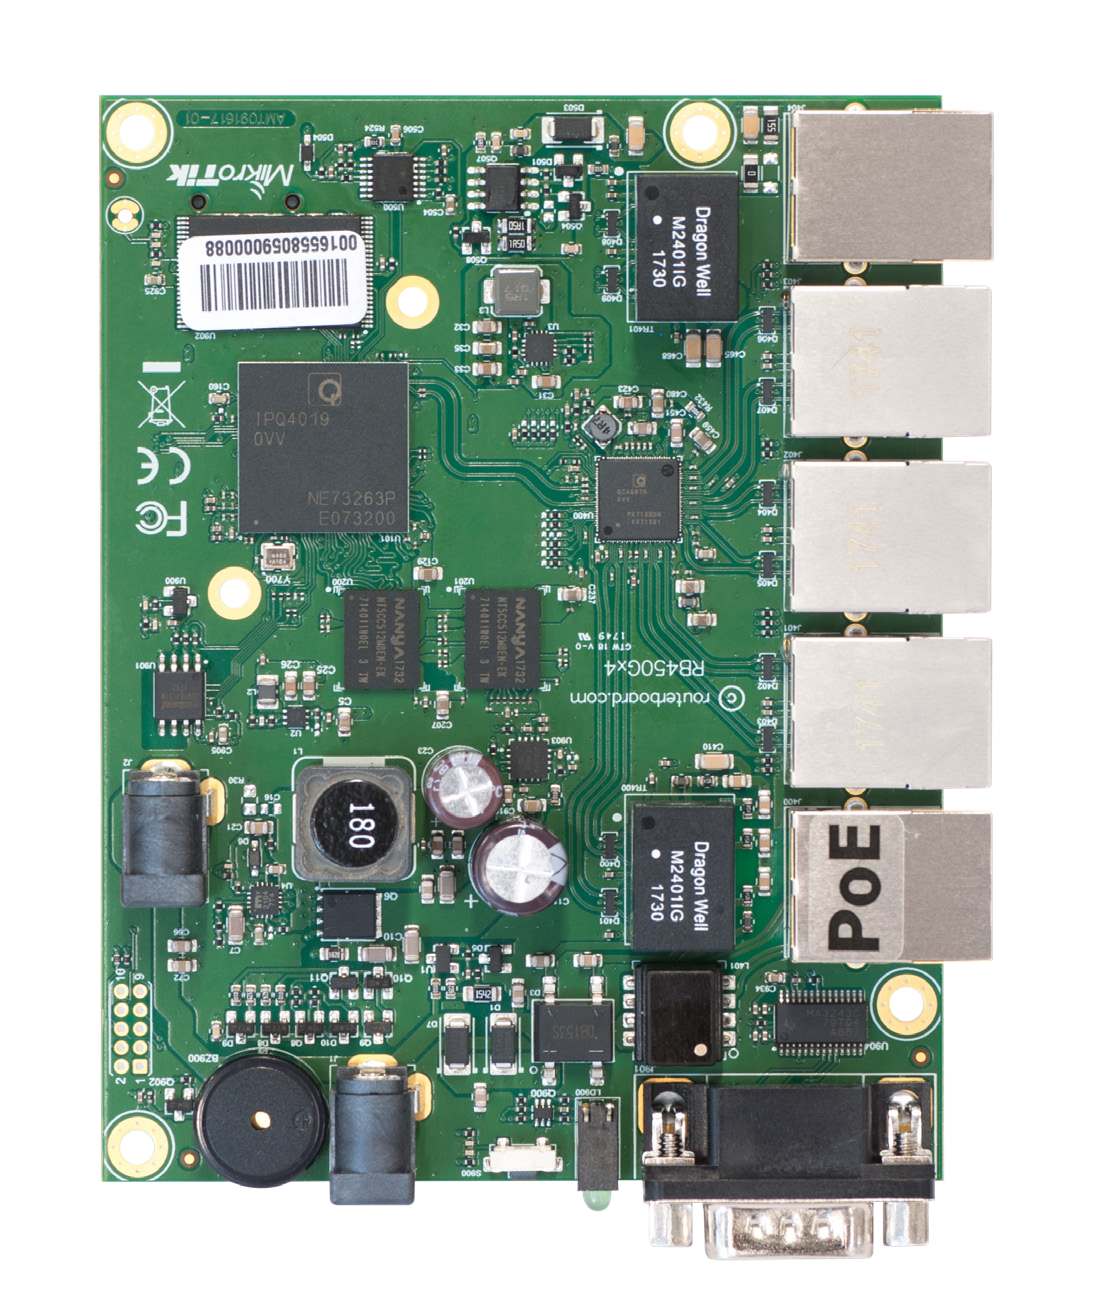 RB450Gx4 Mikrotik RB450Gx4, 5 Gigabit LAN ports, RouterOS L5